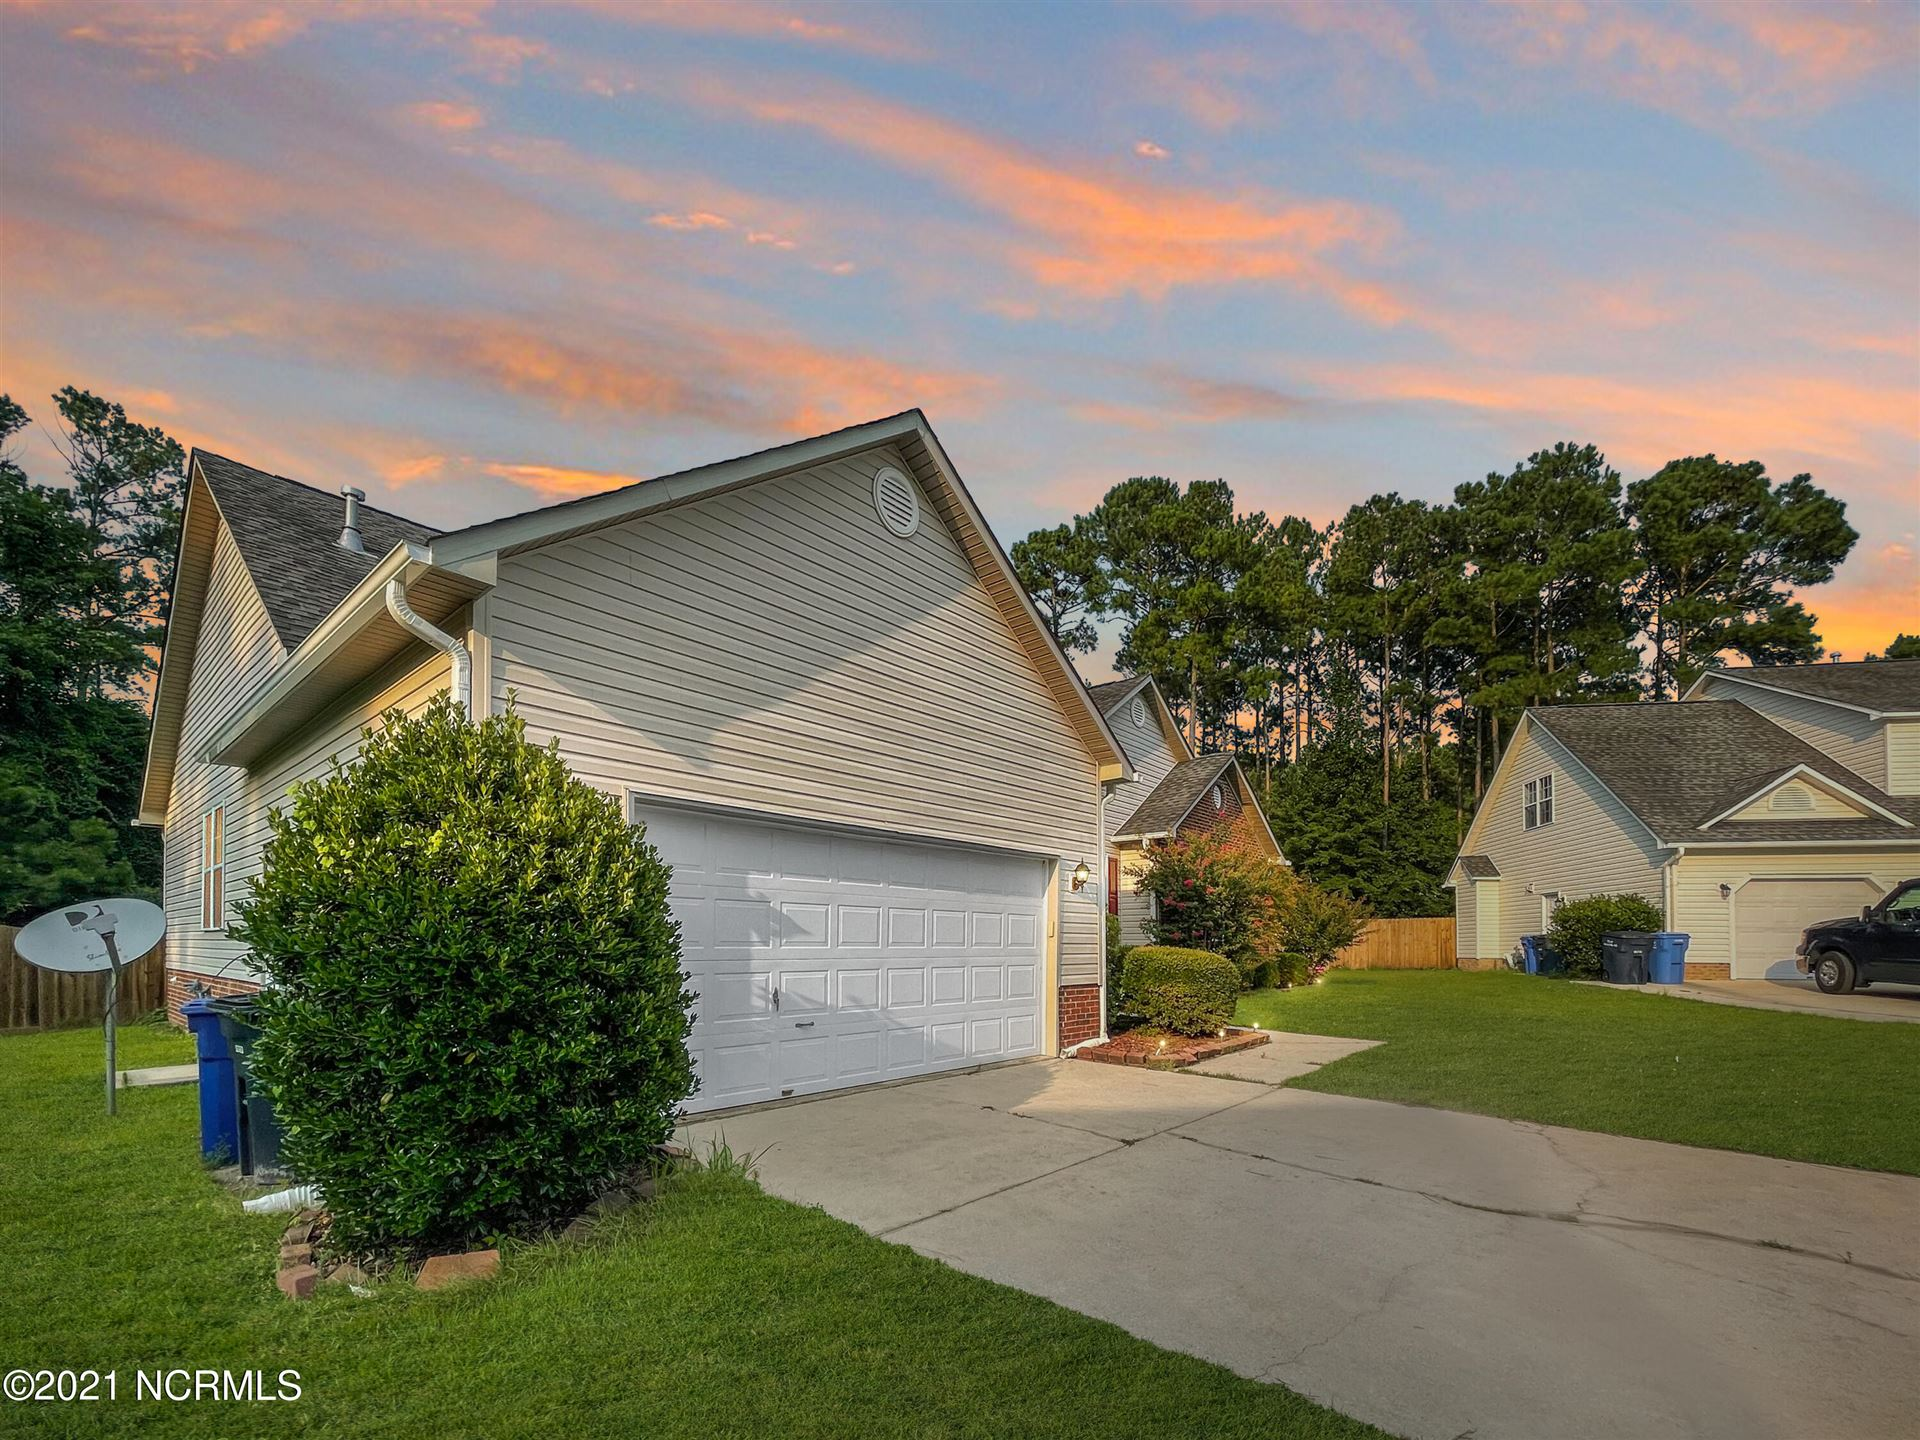 Photo of 312 Burning Tree Lane, Jacksonville, NC 28546 (MLS # 100282544)